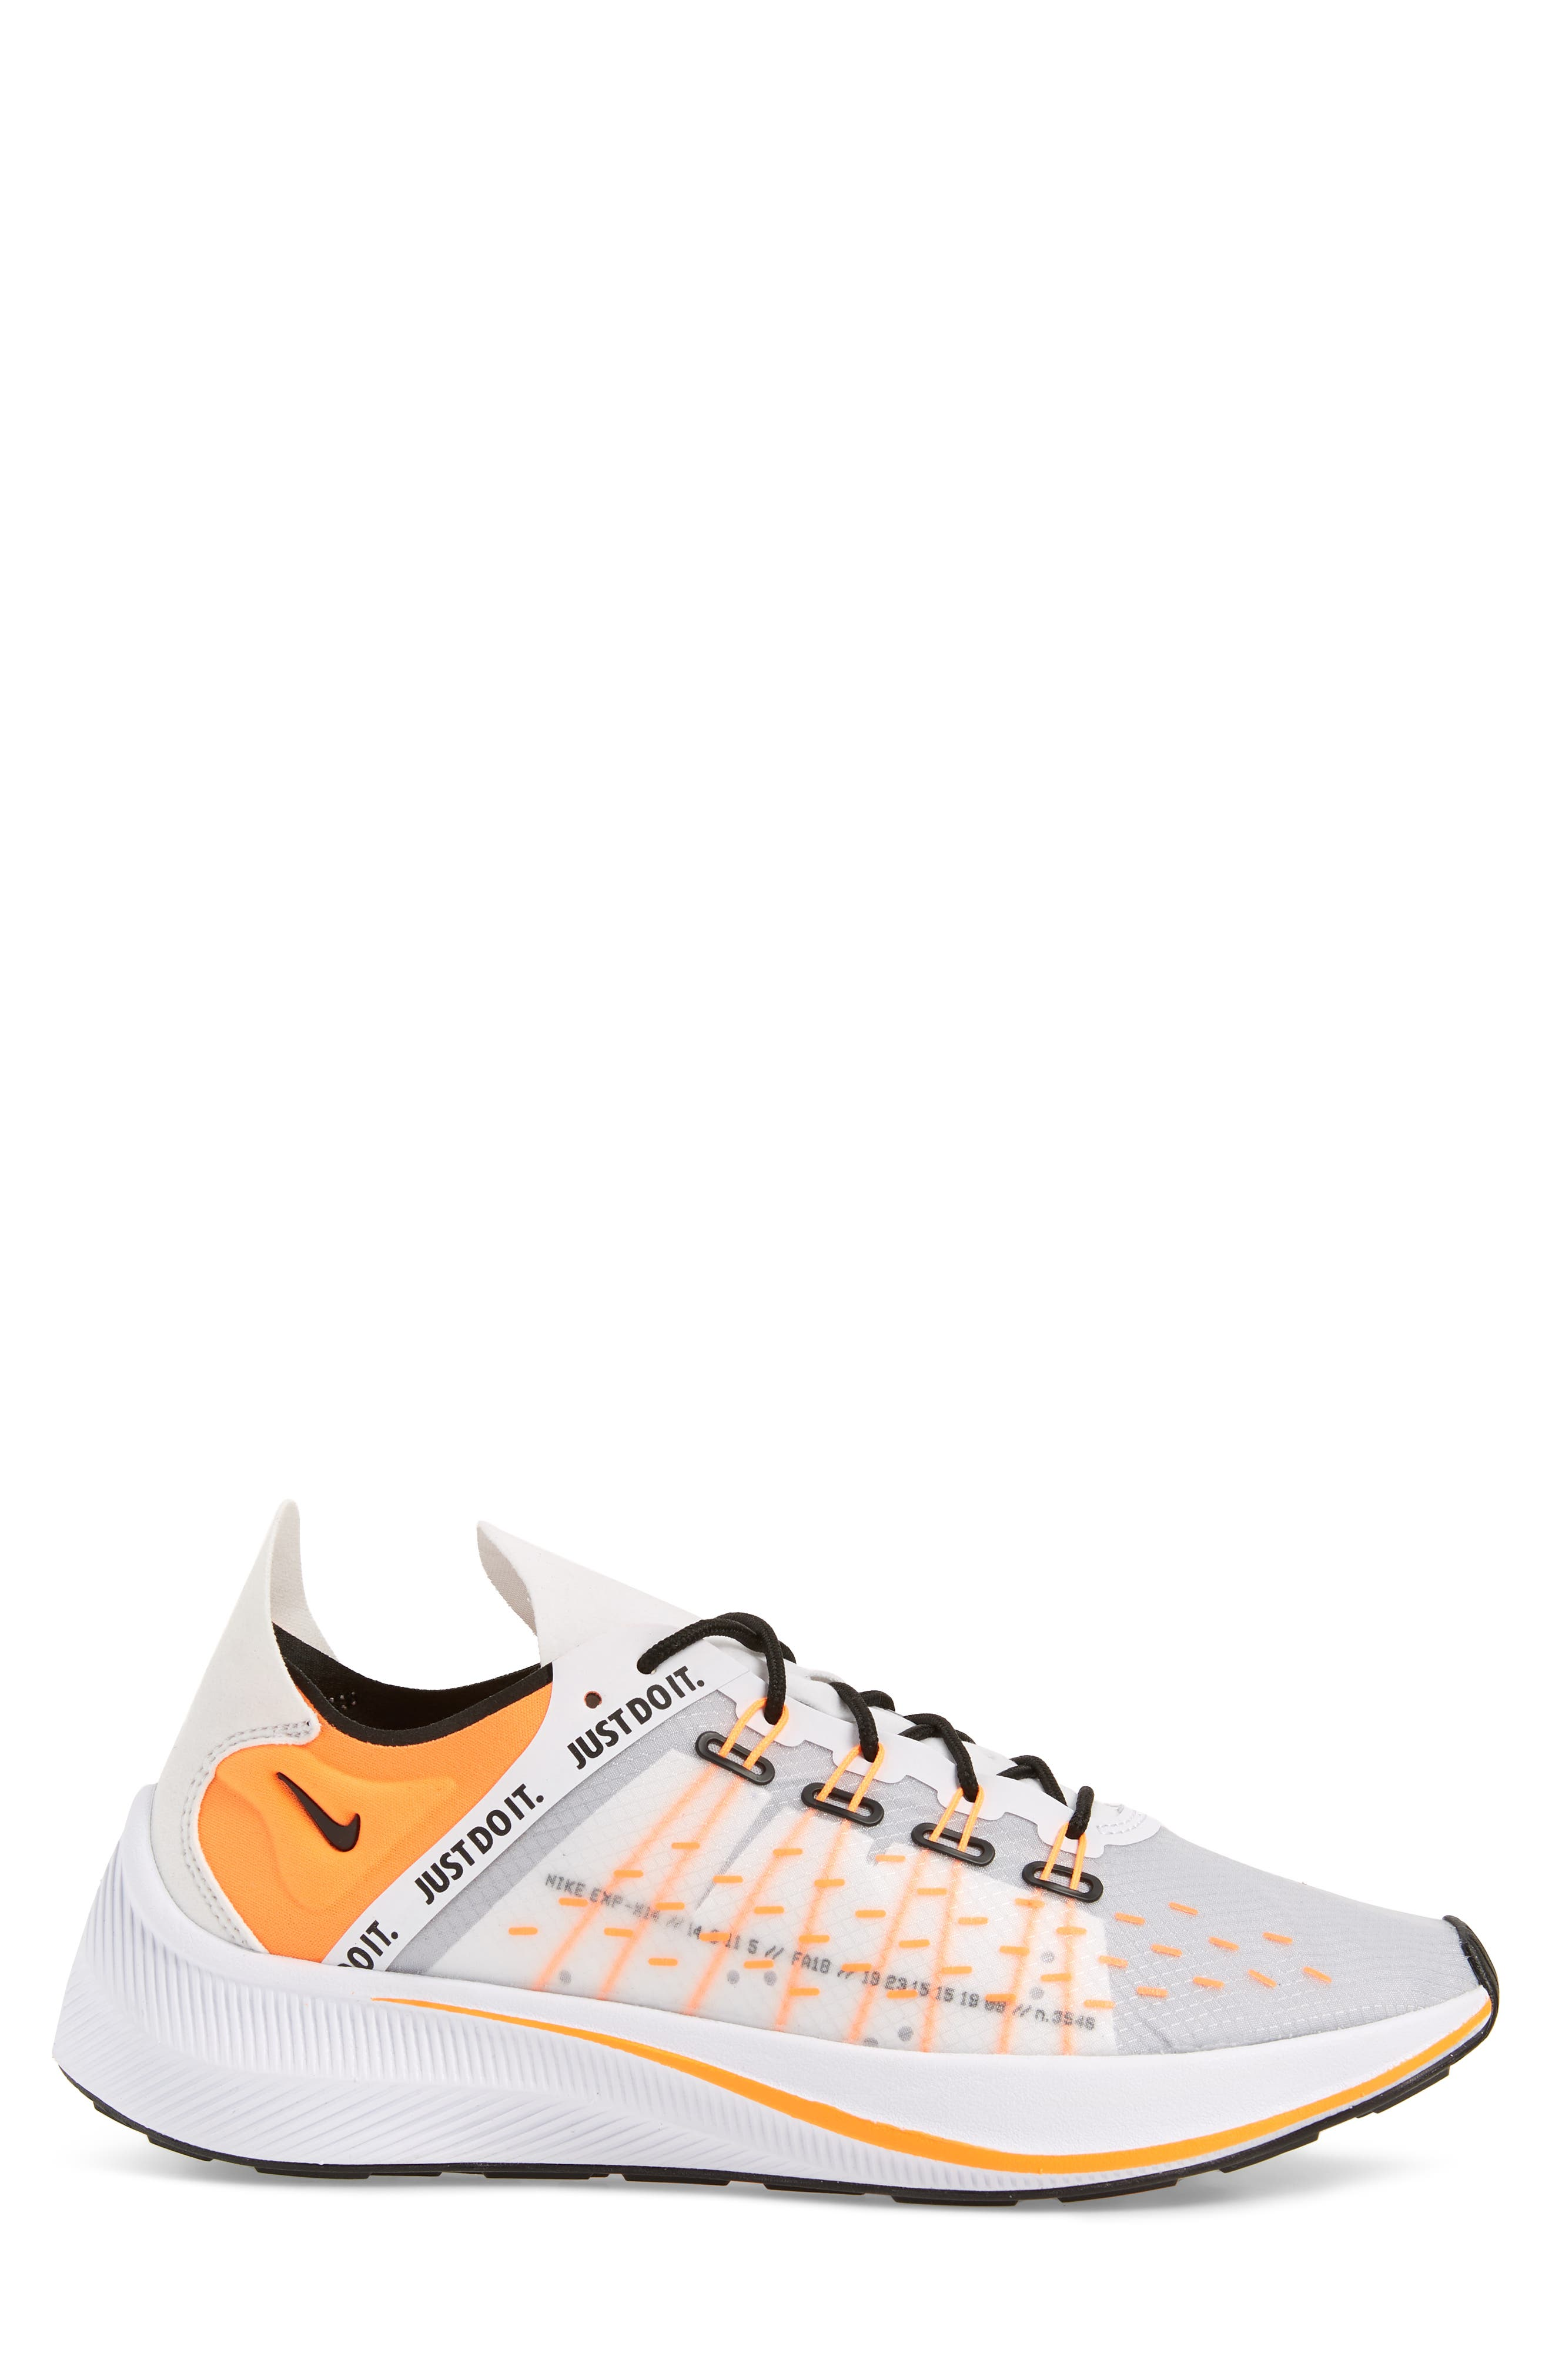 EXP-X14 Just Do It Sneaker,                             Alternate thumbnail 3, color,                             WHITE/ TOTAL ORANGE/ BLACK